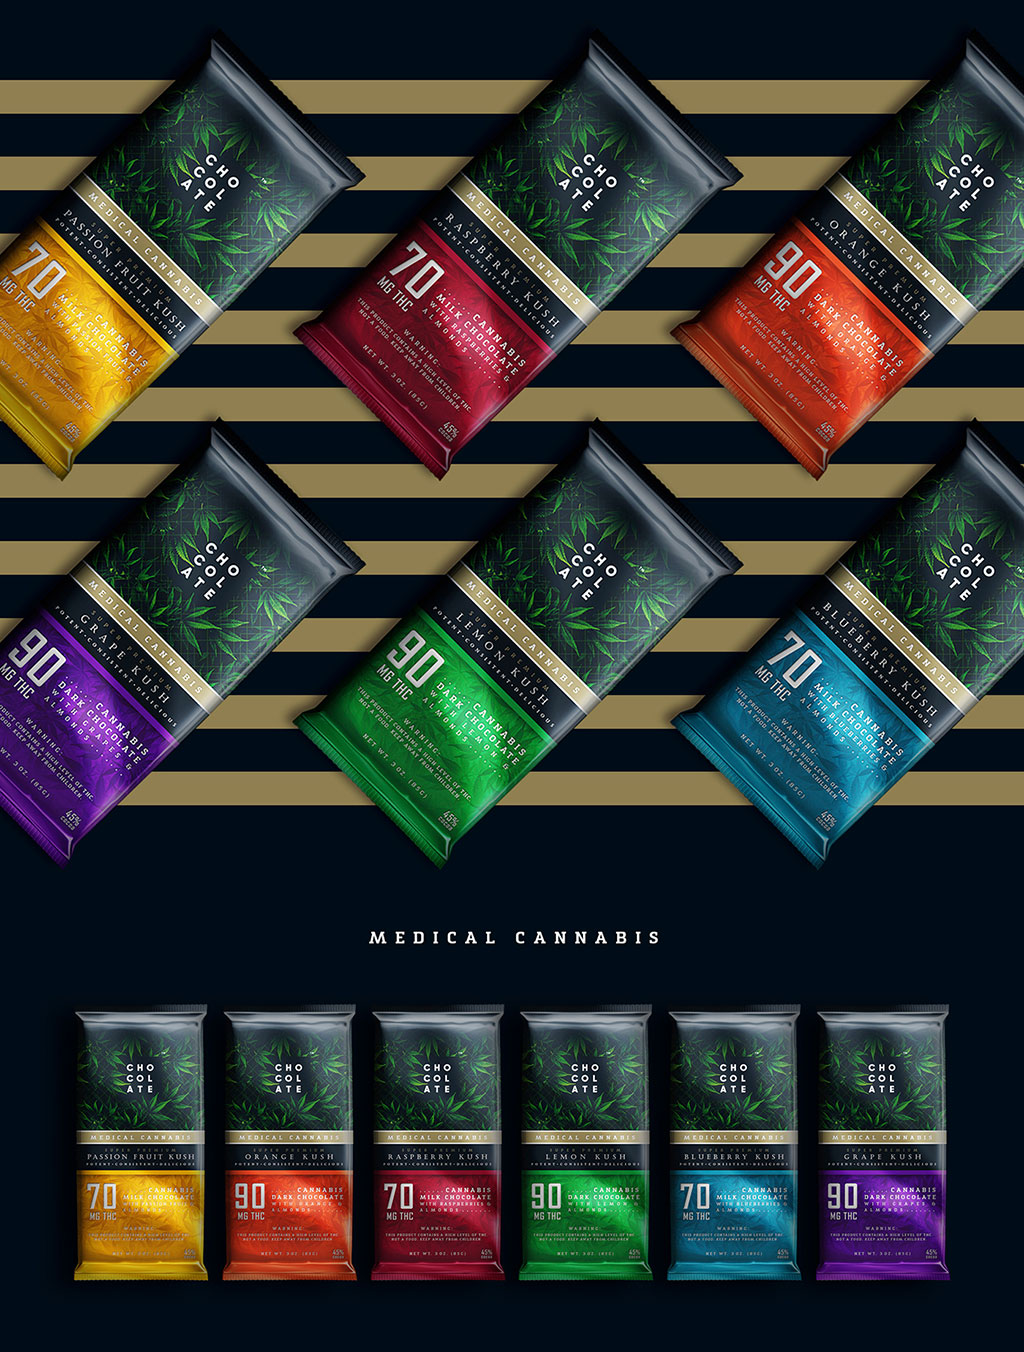 MedicalCannabis-Chocolate-Packaging-Design-Concept